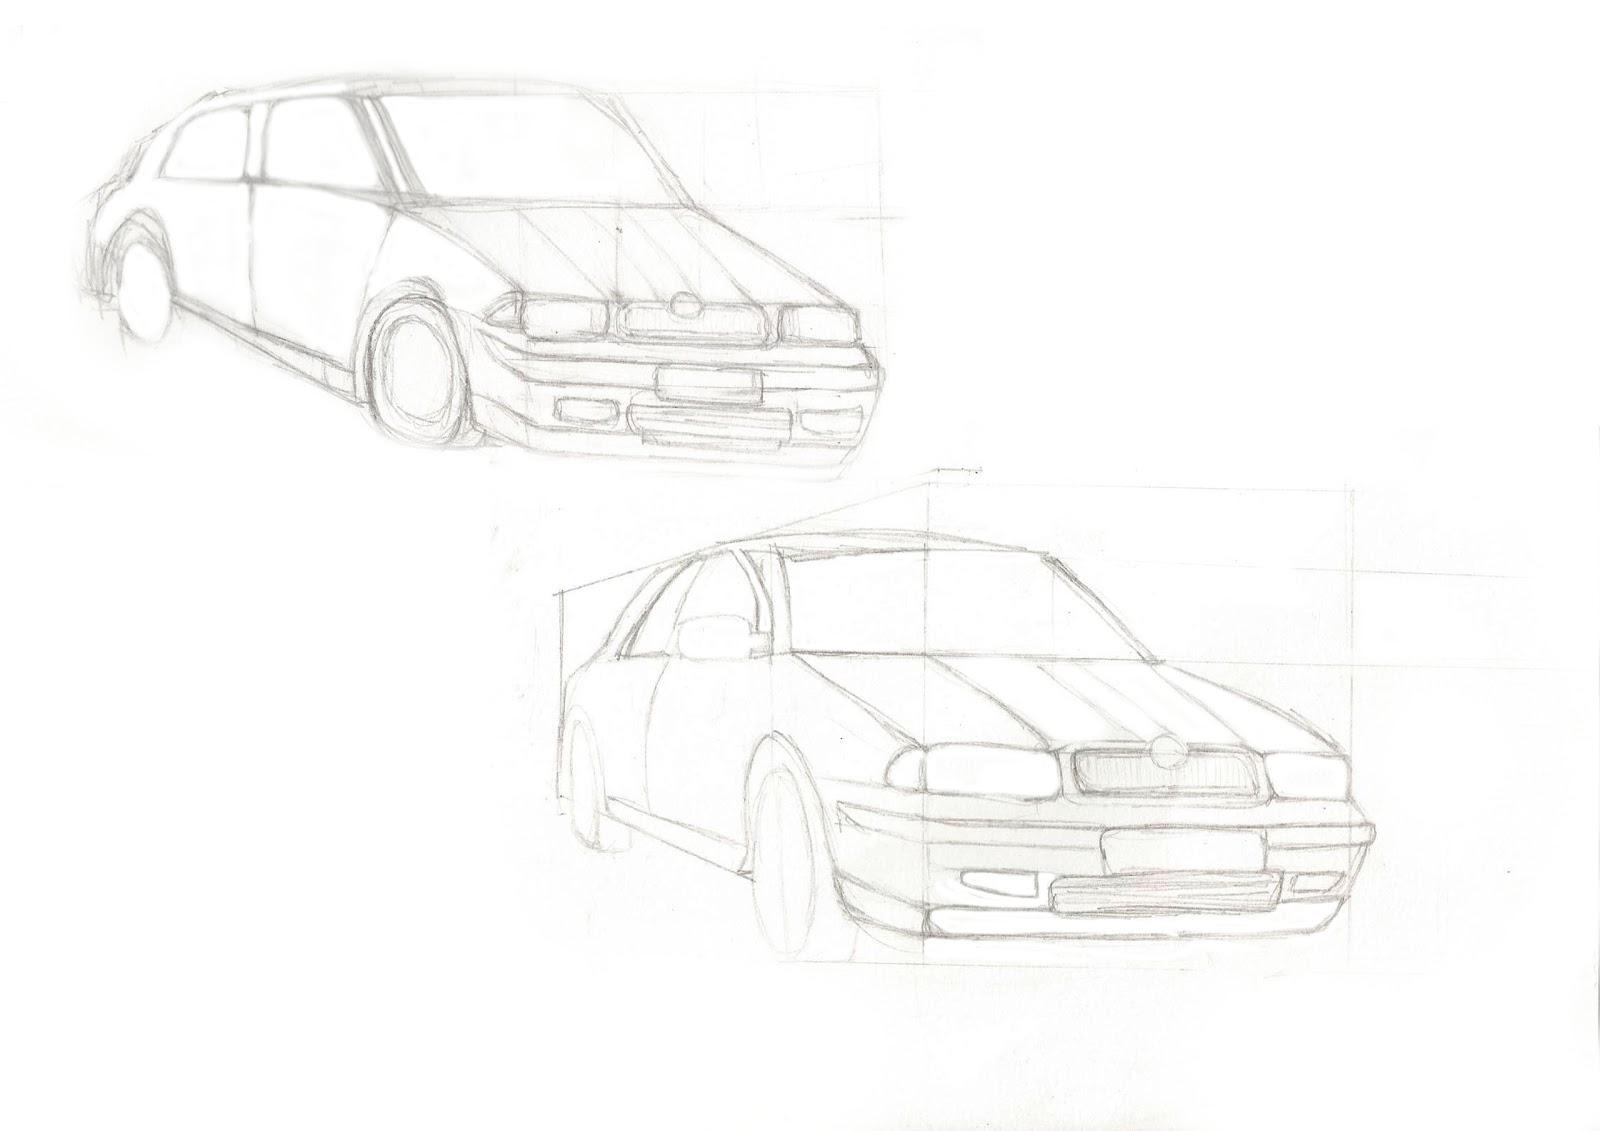 Henri\'s Game Art Blog: My Progress of Drawing Cars!